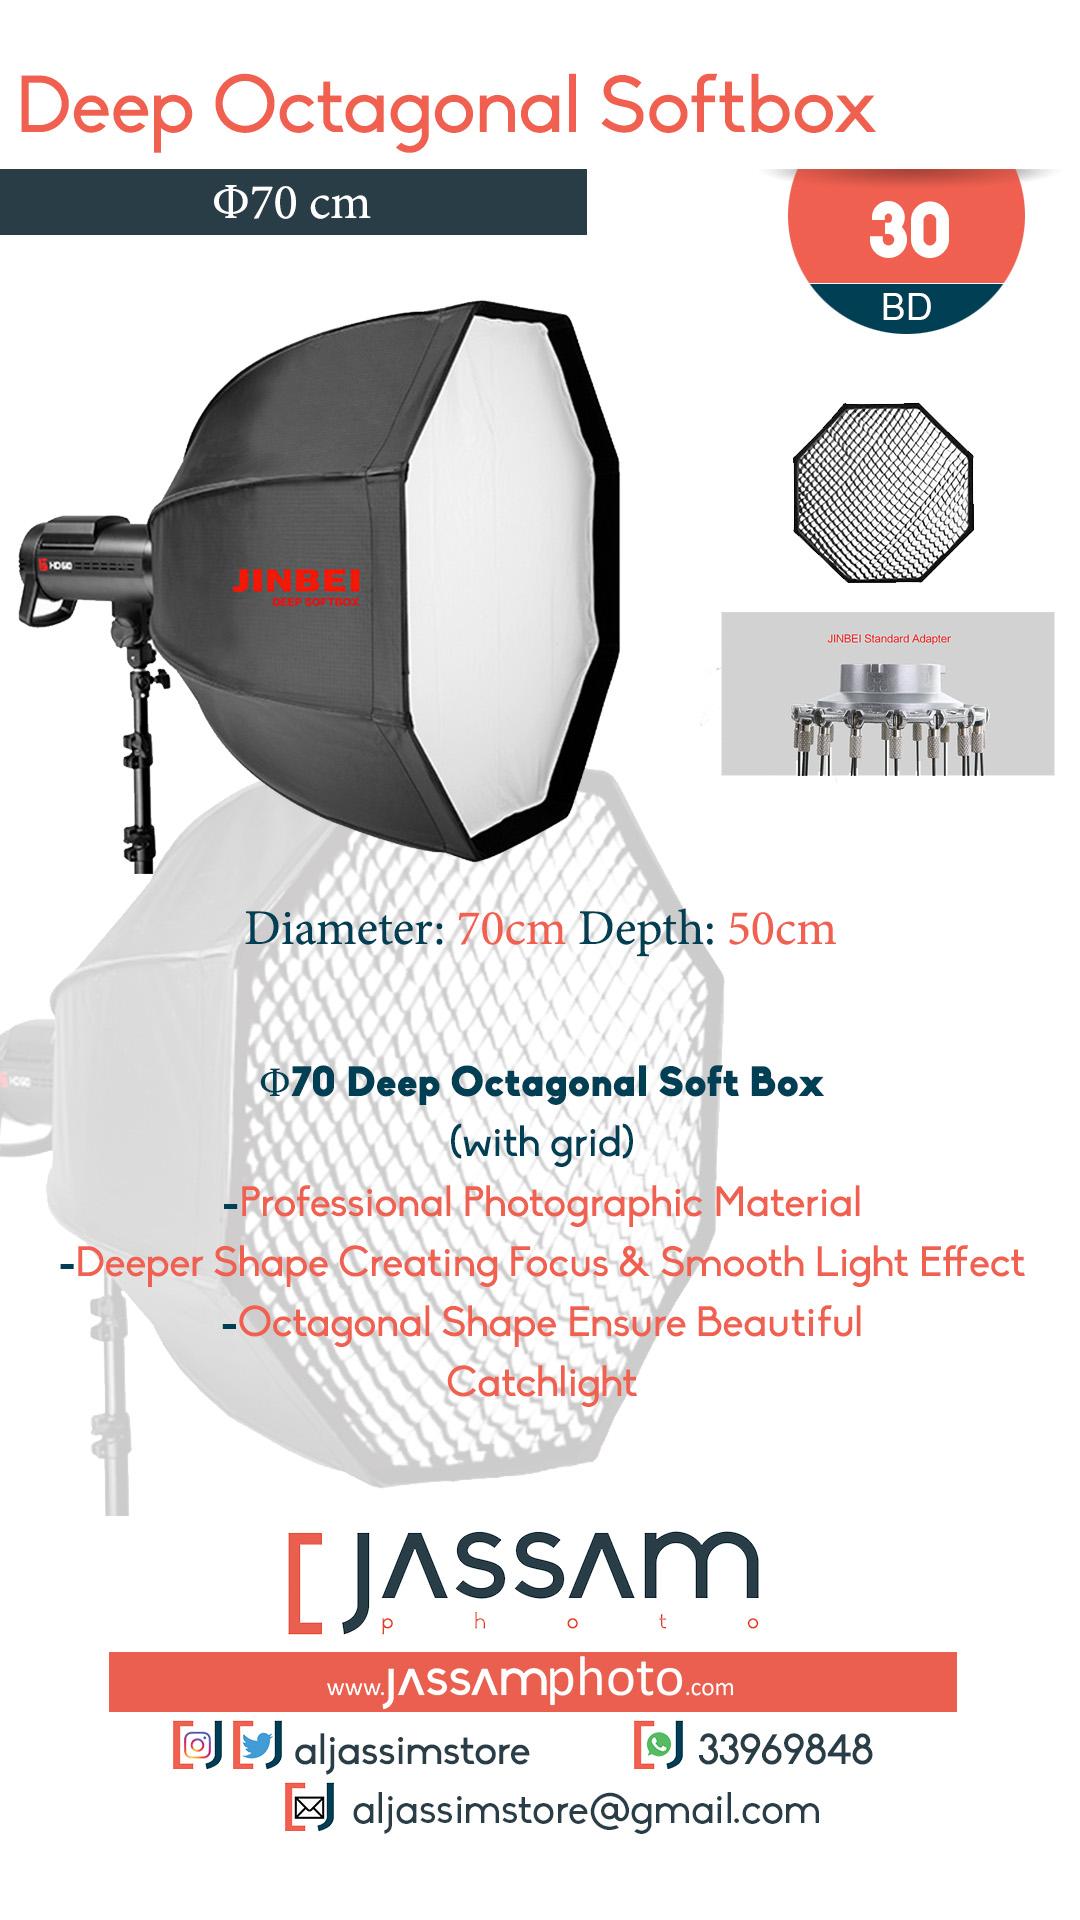 Deep Octa Softbox 70cm